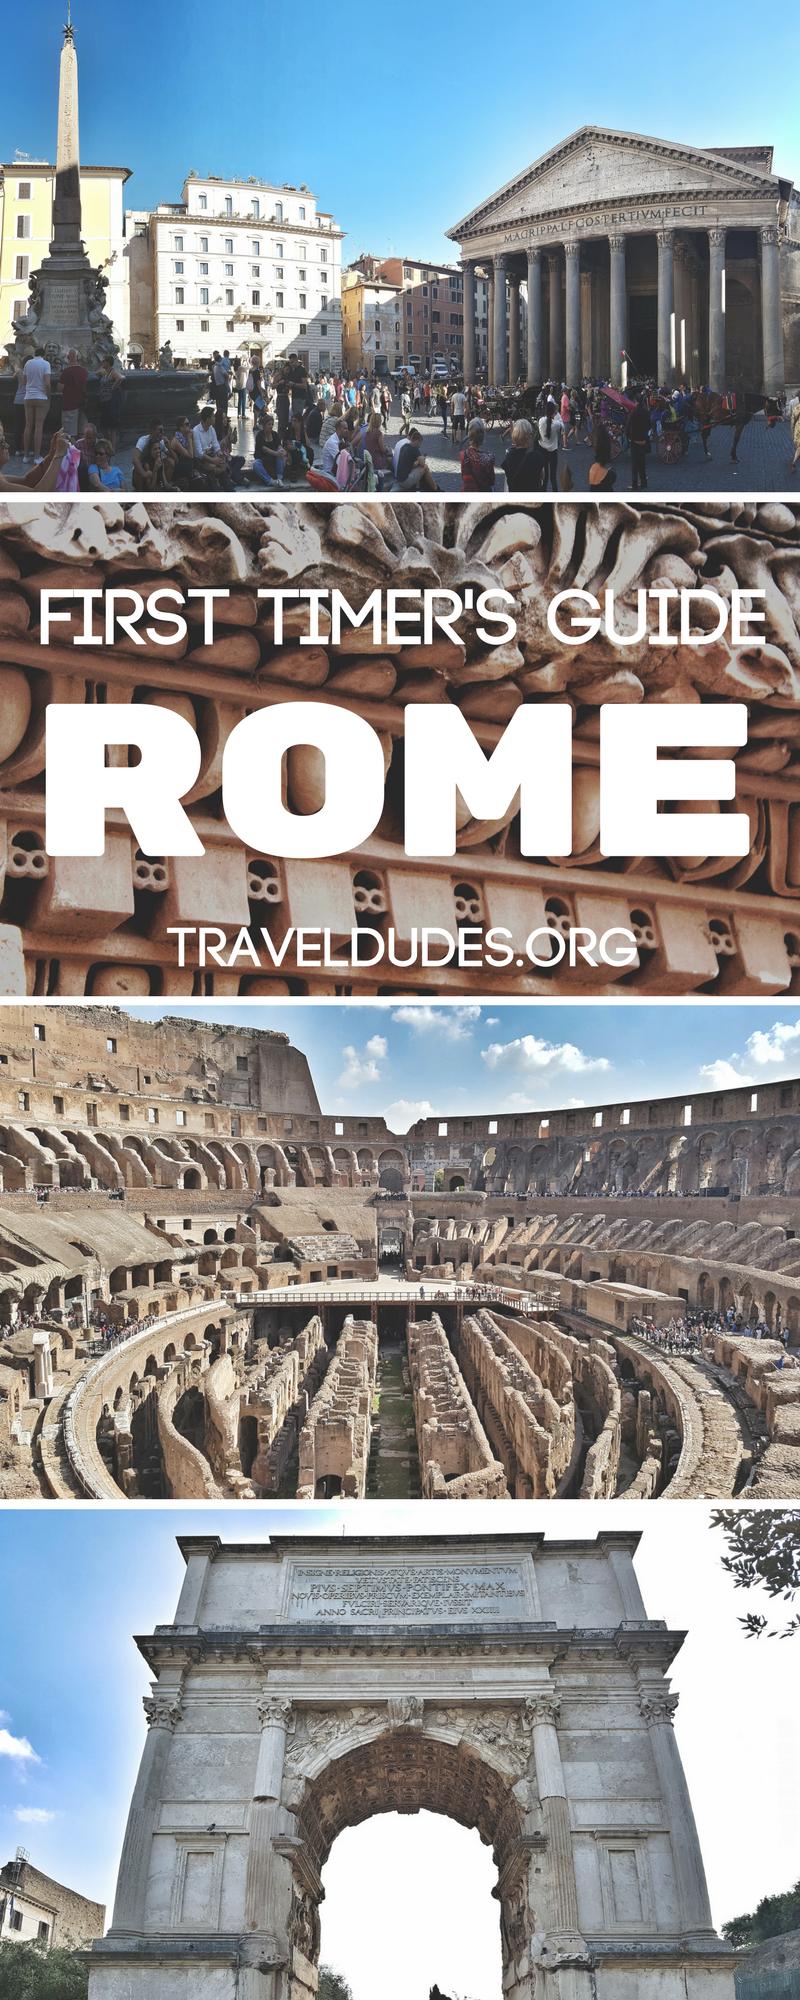 Admire Ancient Ruins at the Roman Forum